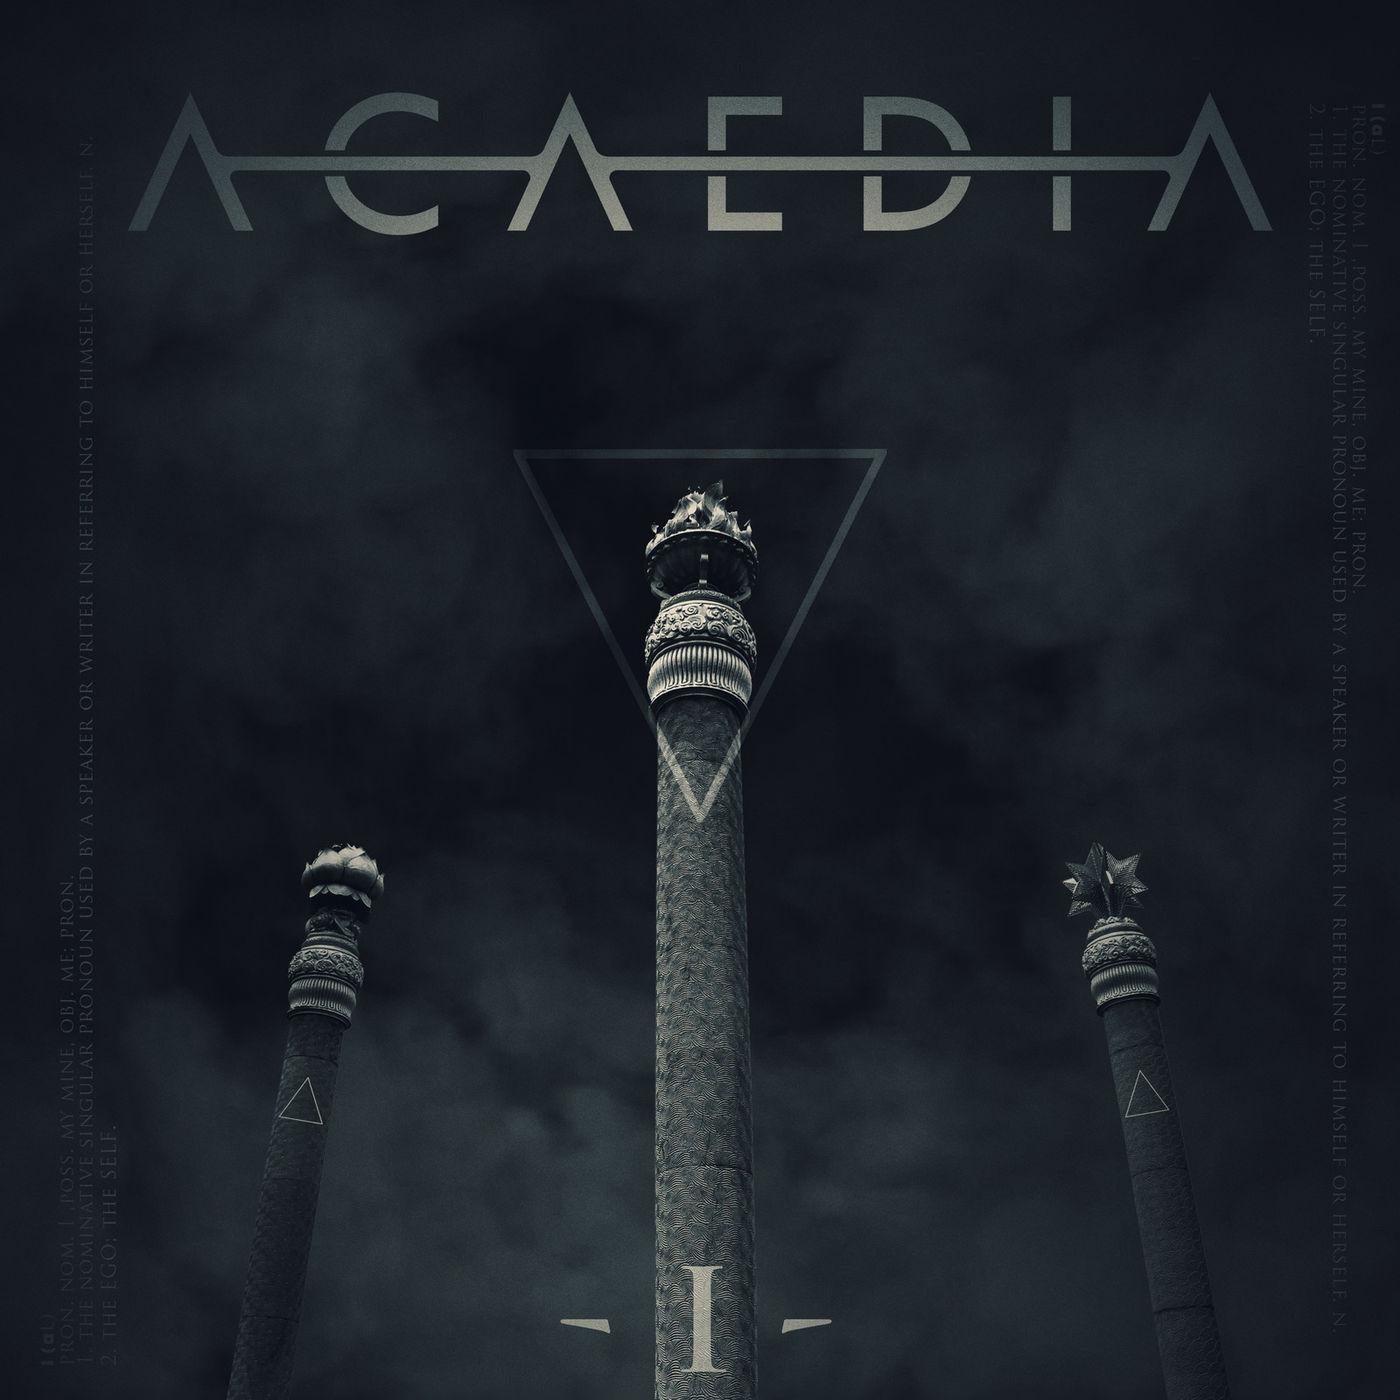 Acaedia - I [Single] (2018)